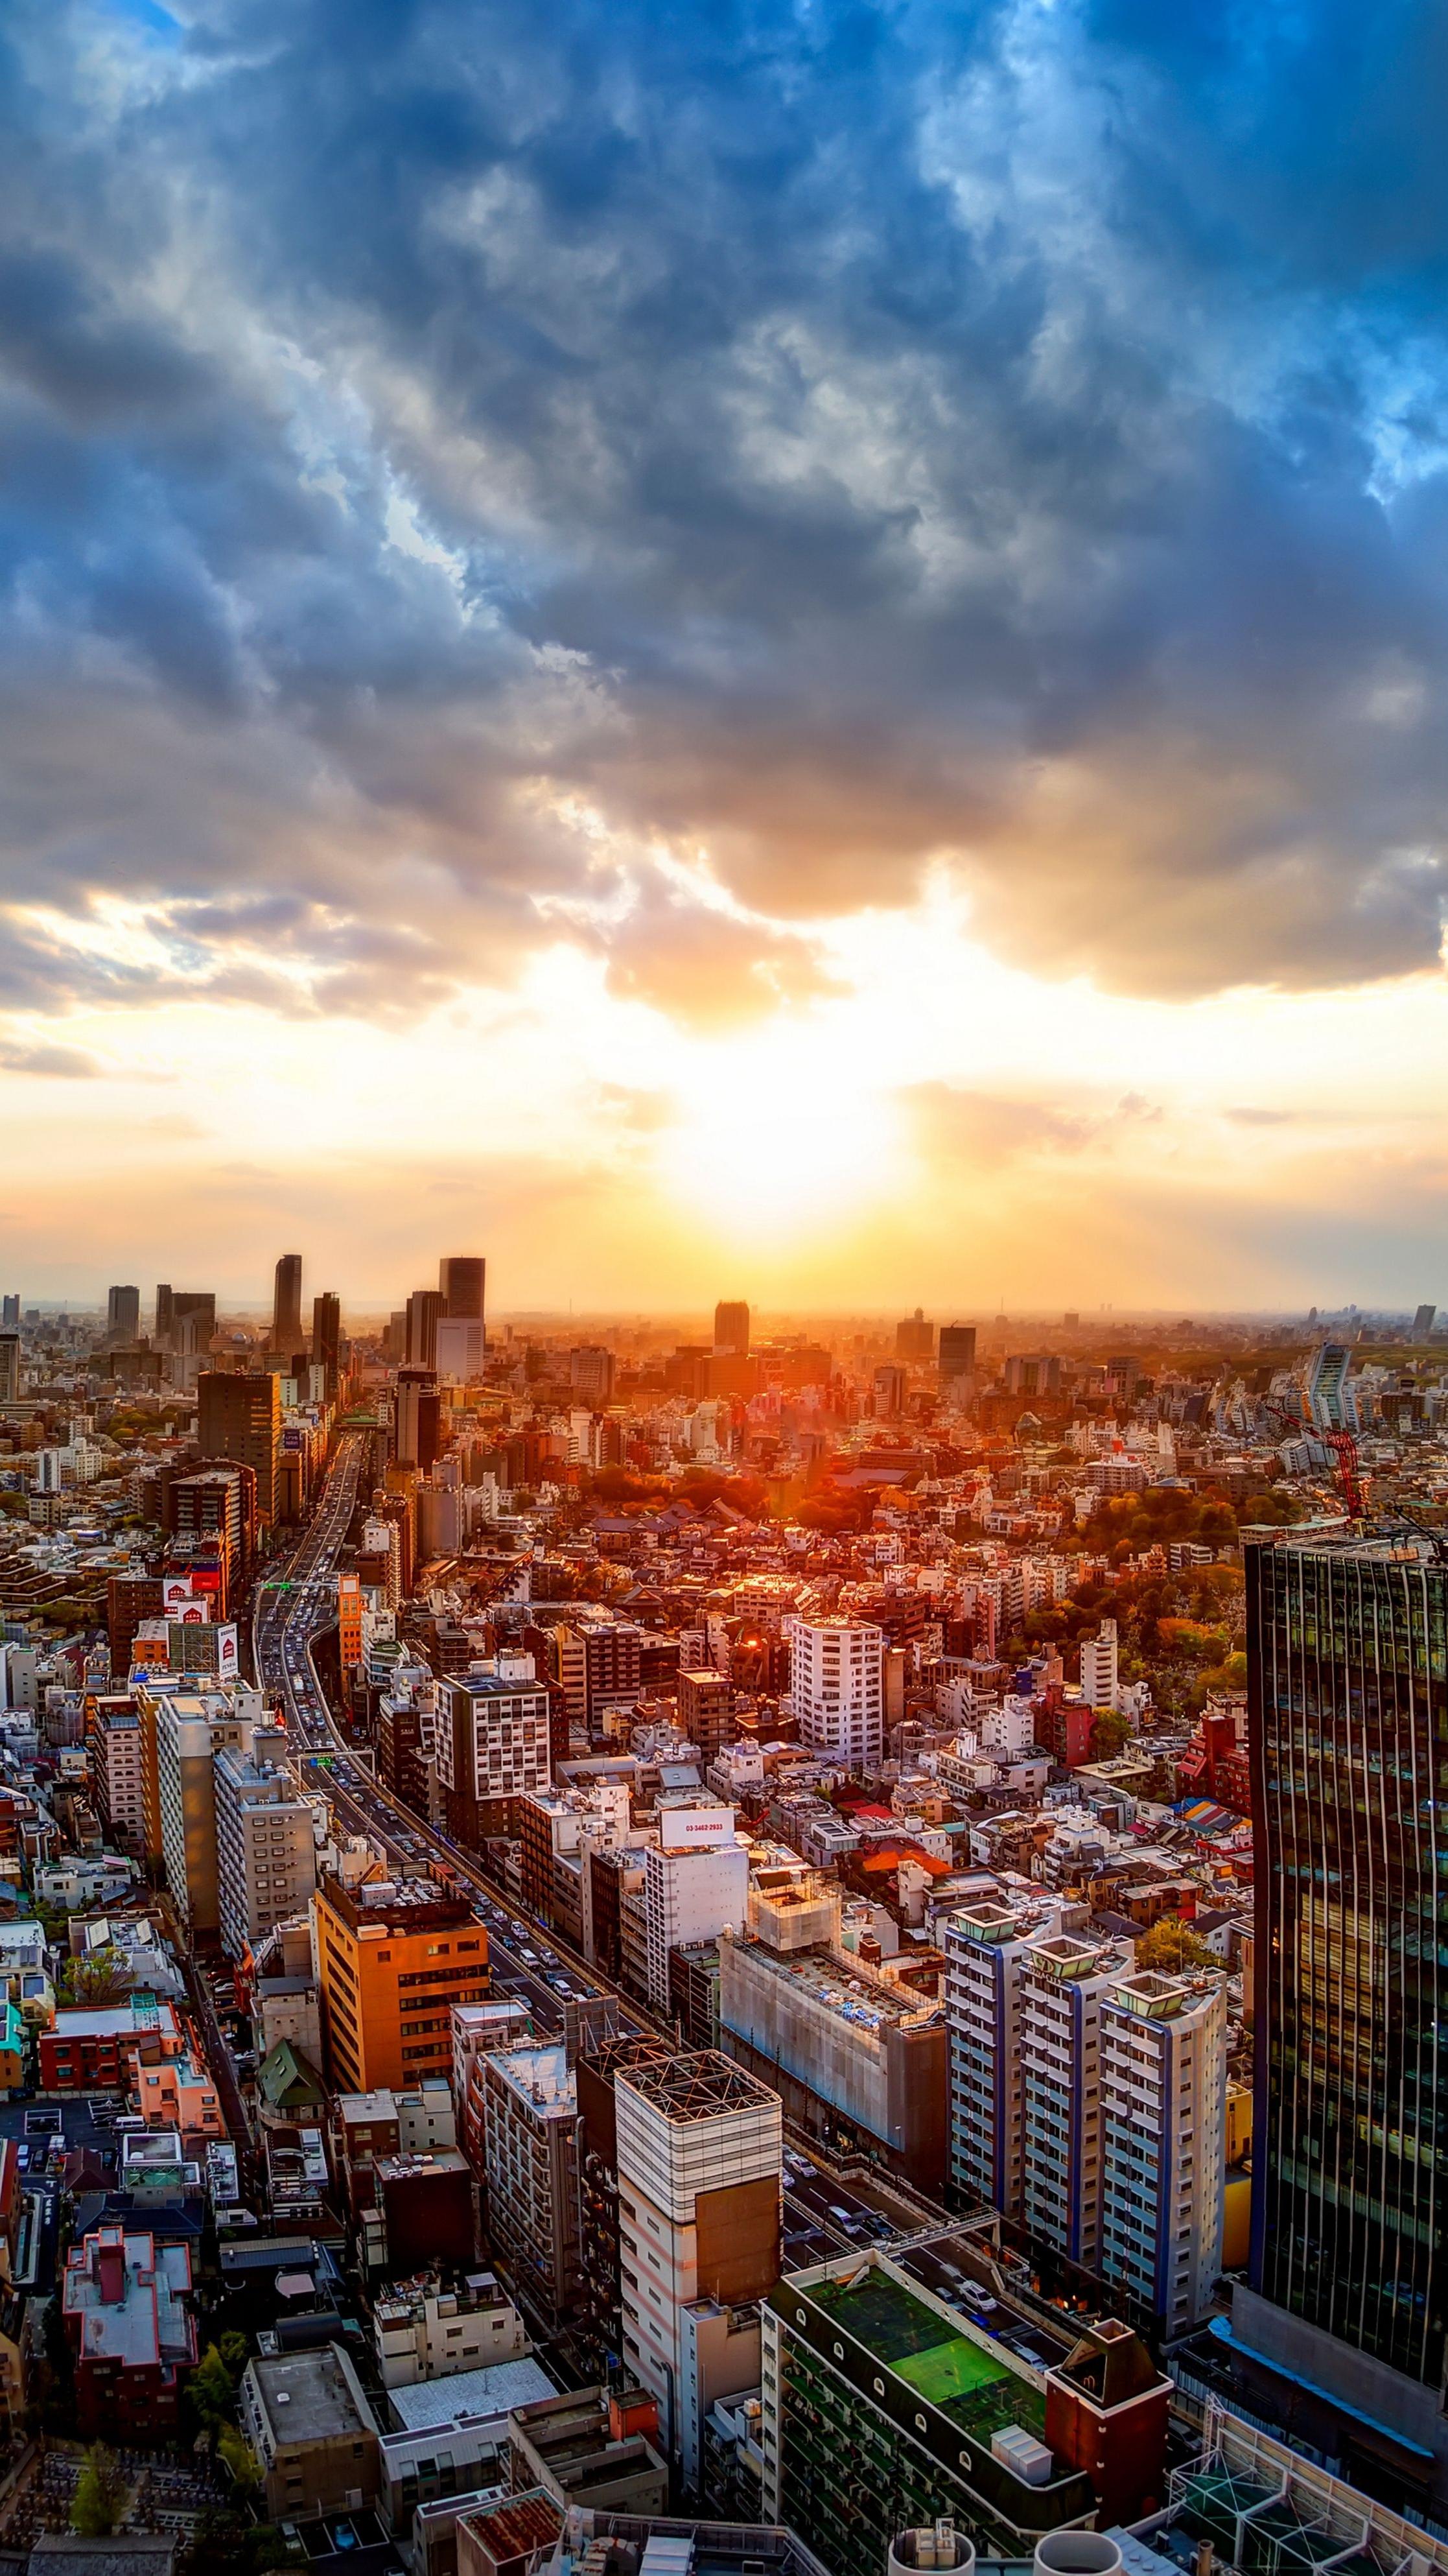 Sunrise in tokyo iphone wallpaper iphone wallpapers - Japanese wallpaper phone ...